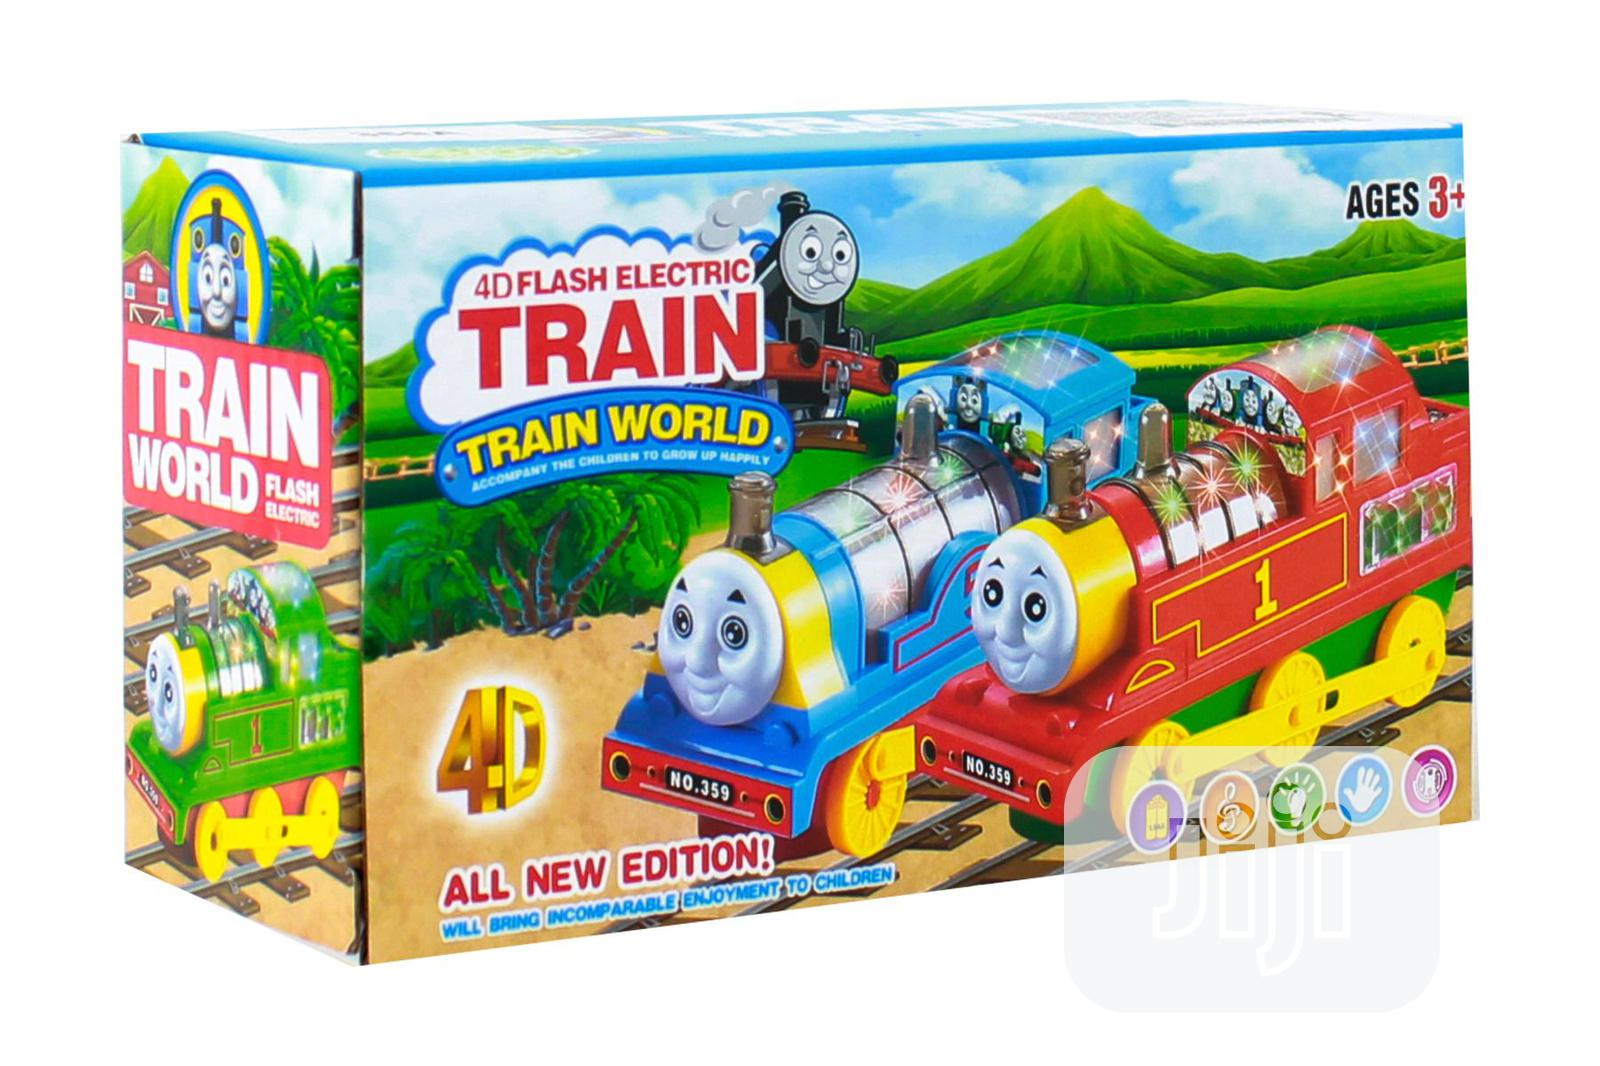 4D Flash Electric Train